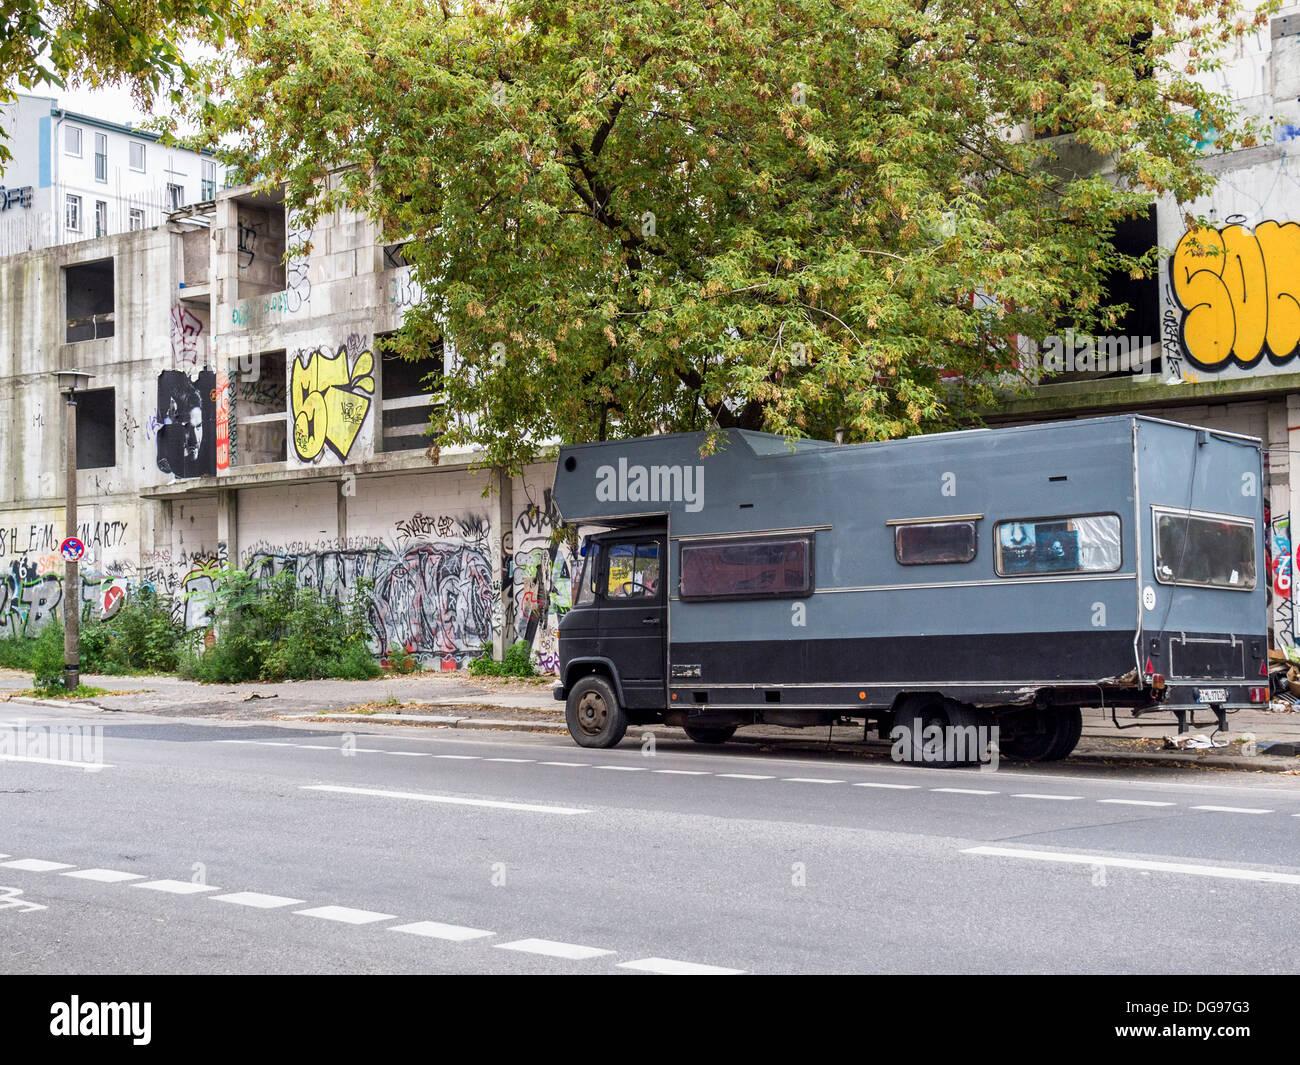 mobilheim mieten berlin mobilheim stellplatz ebay. Black Bedroom Furniture Sets. Home Design Ideas